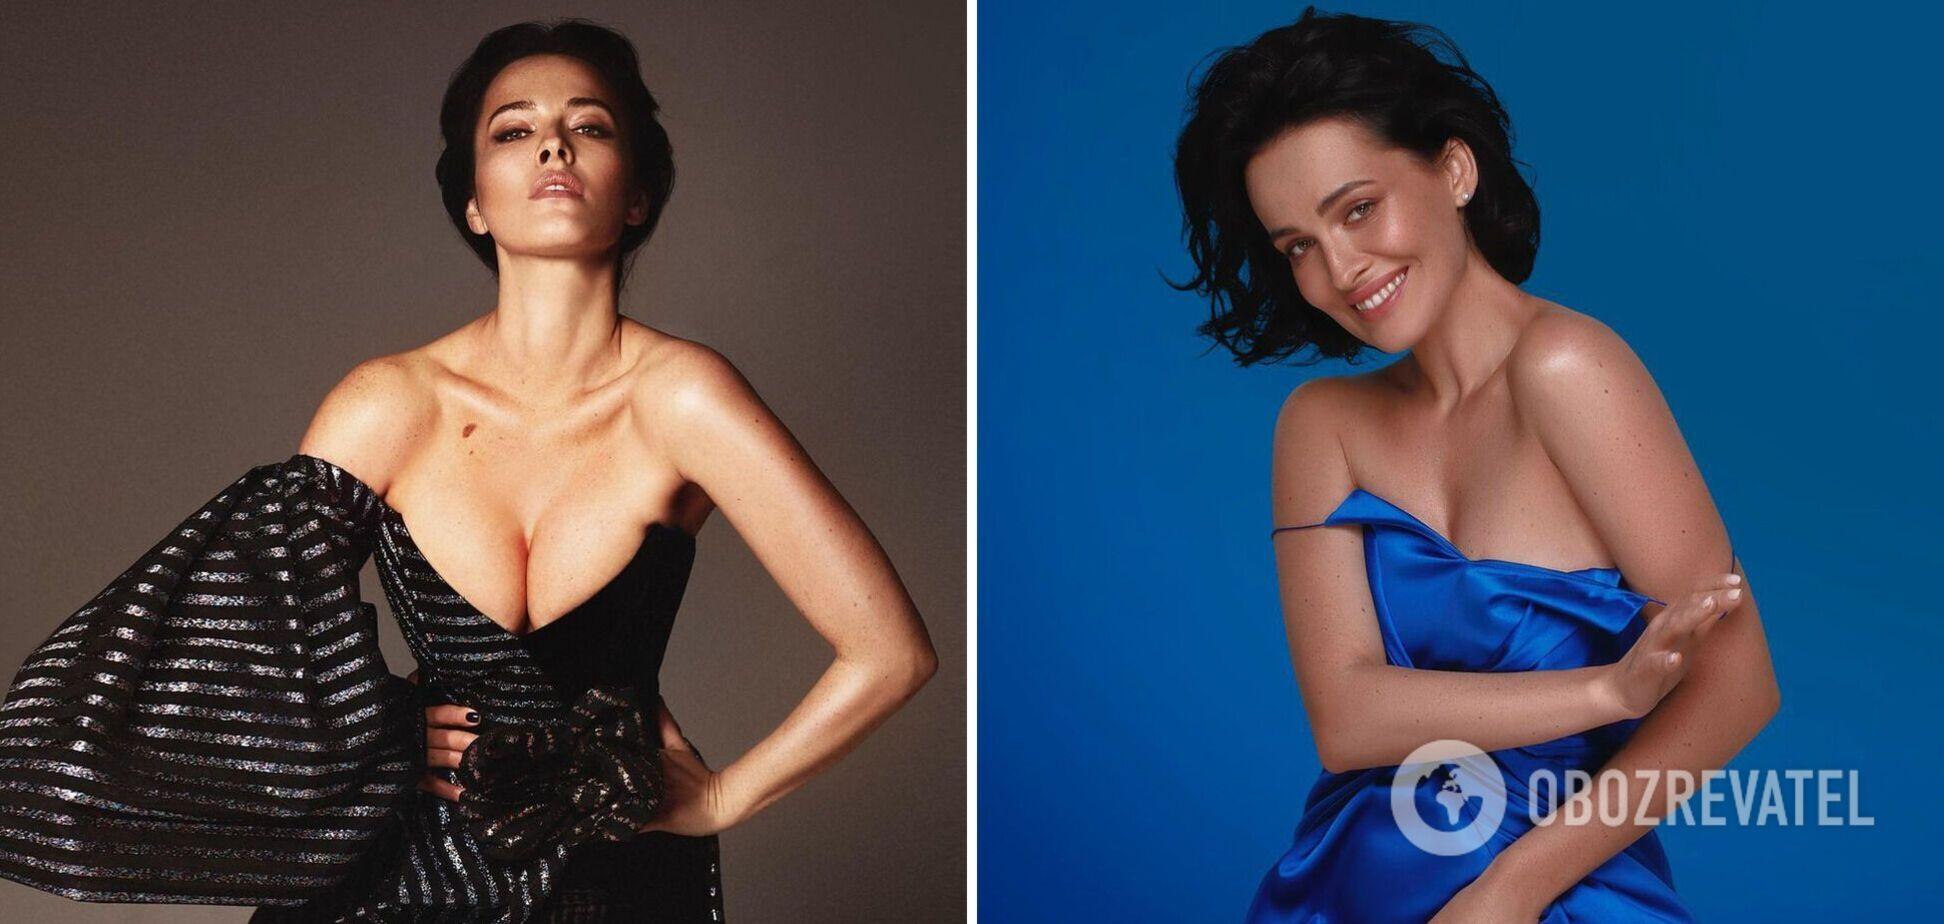 Українська модель і співачка Даша Астаф'єва